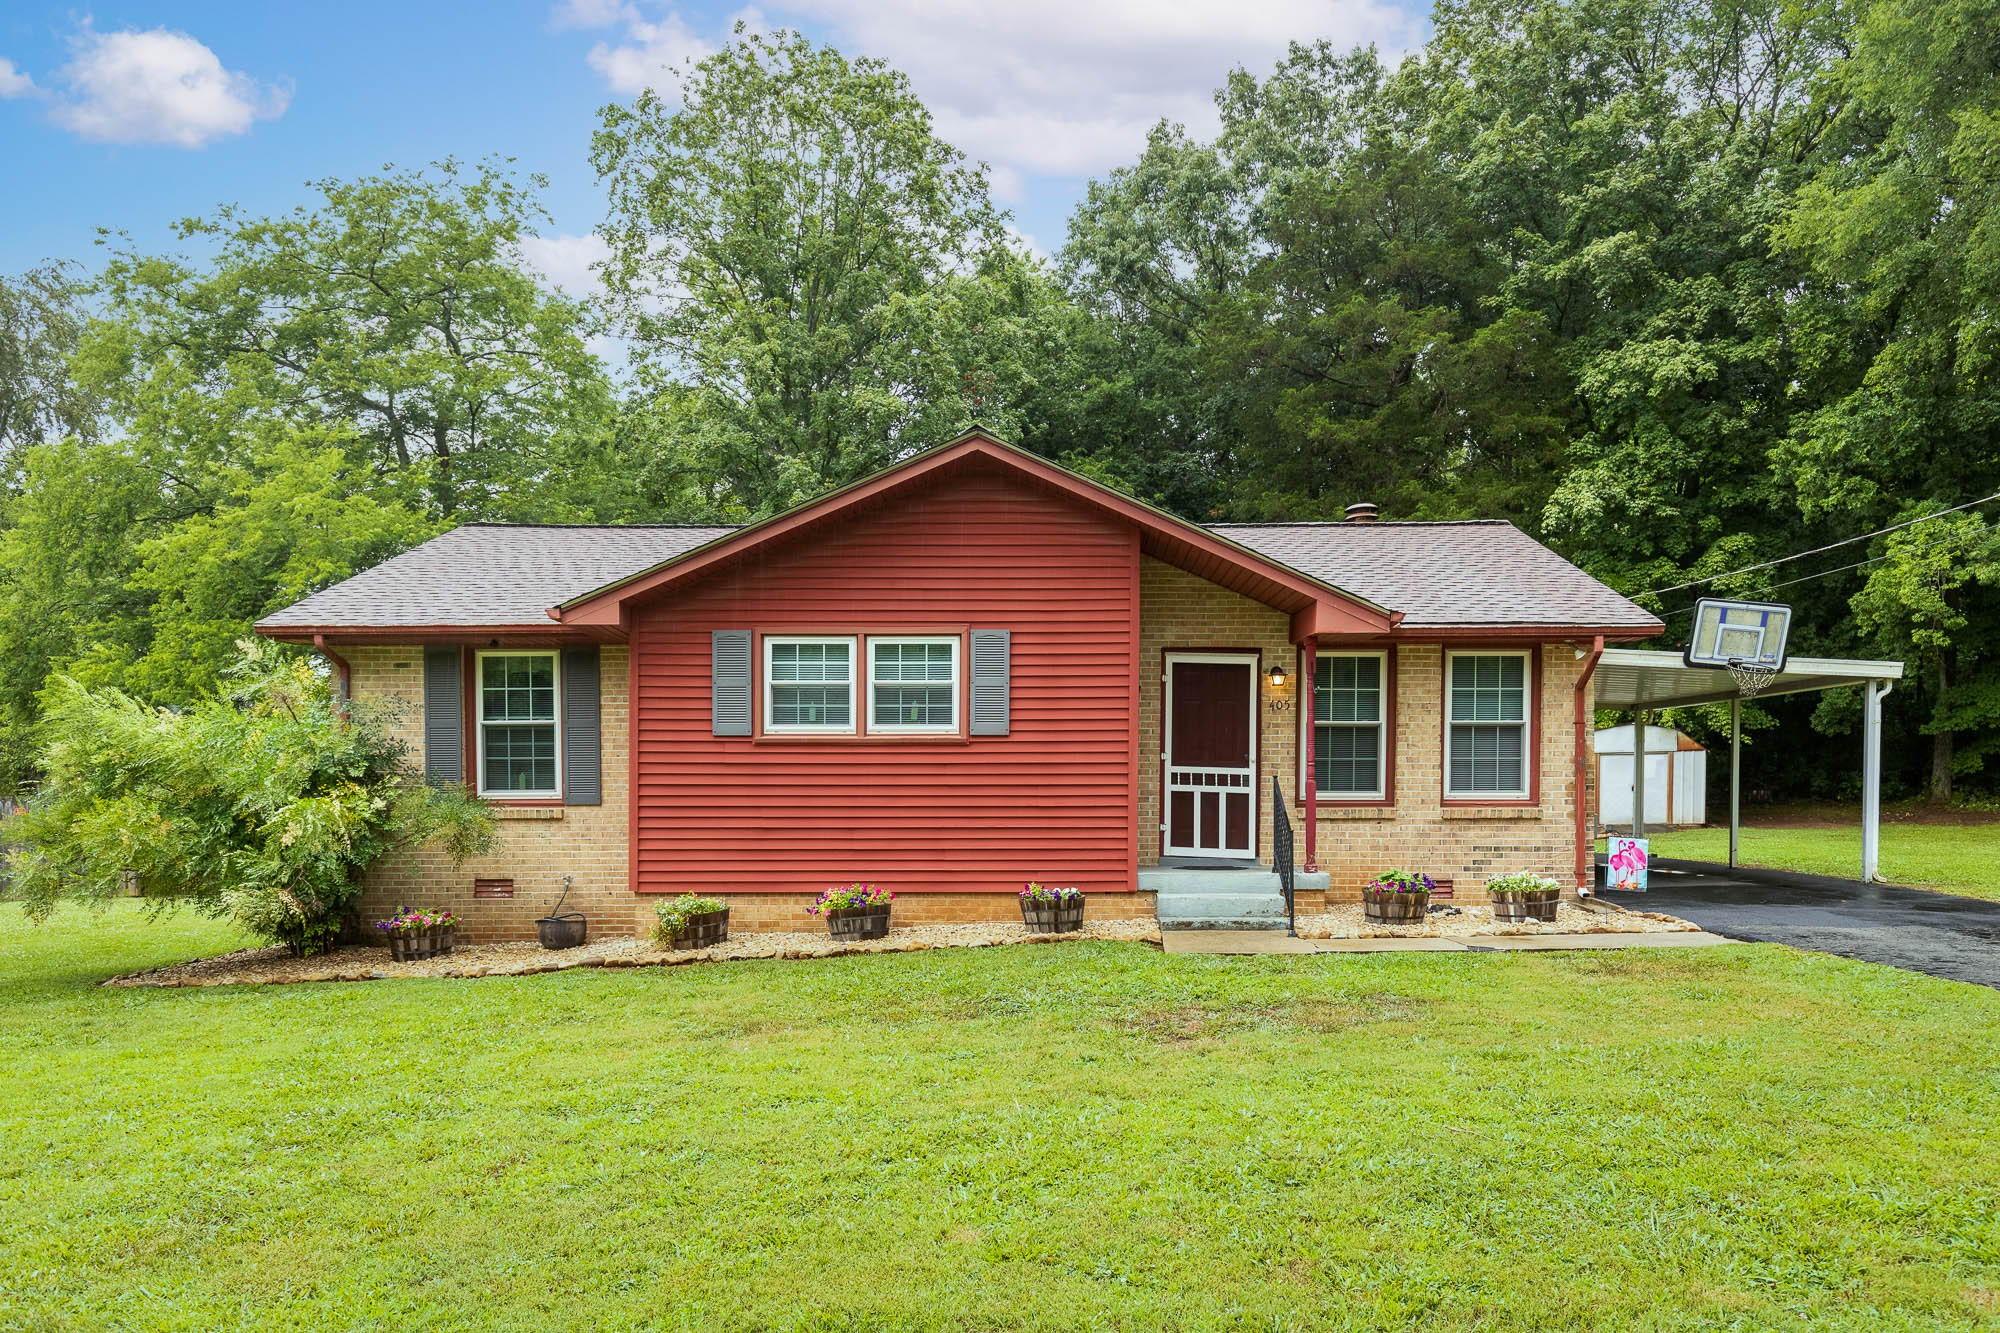 Belle Meade Homes Real Estate Listings Main Image